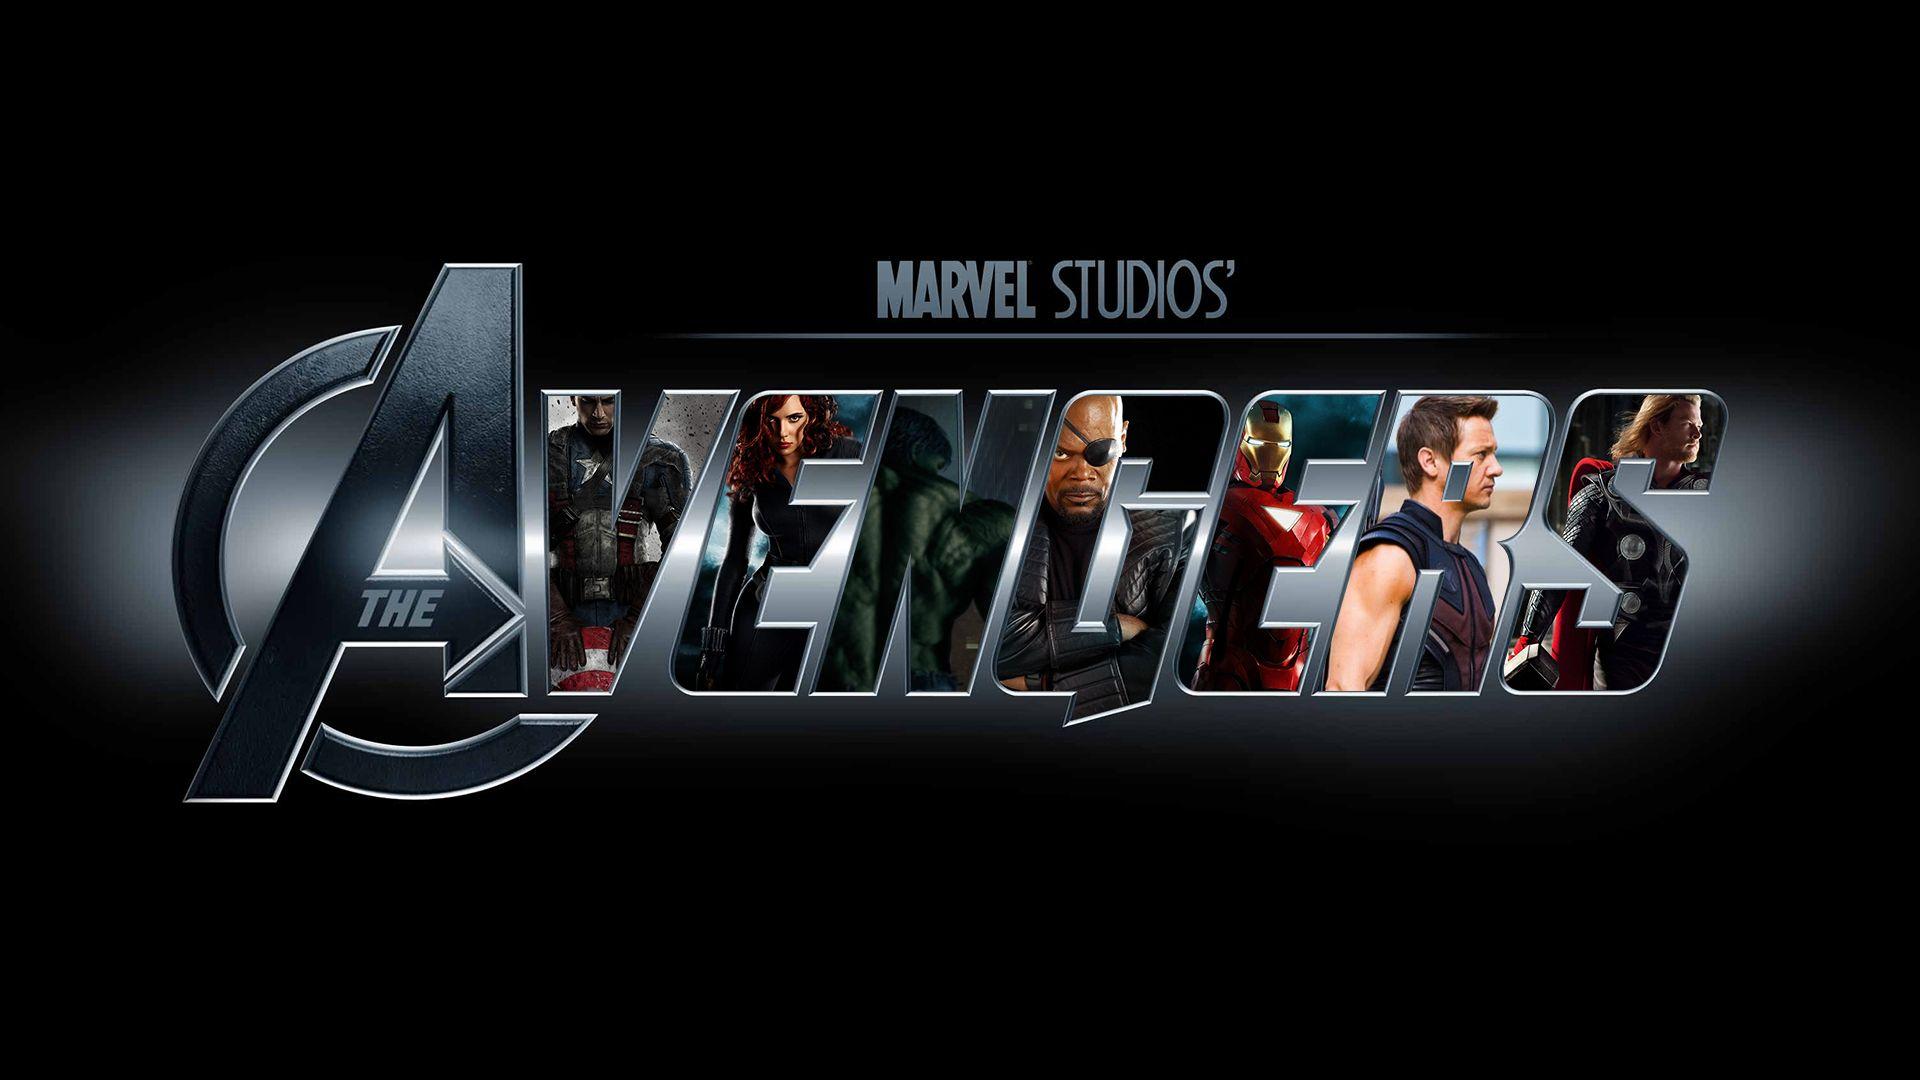 avengers logo background wallpaper Desktop Backgrounds